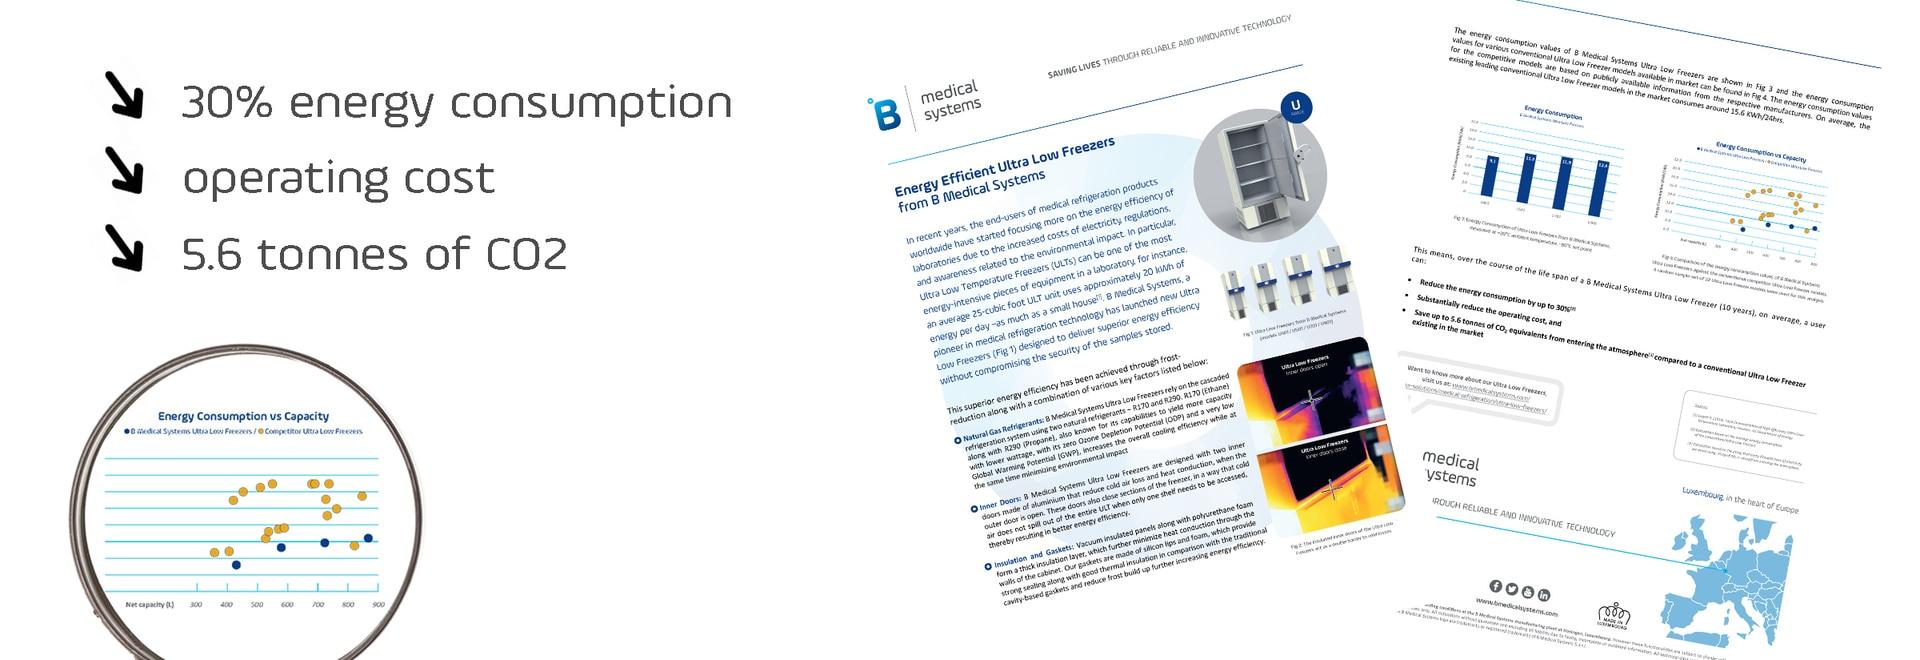 Energy Efficient Ultra Low Freezers